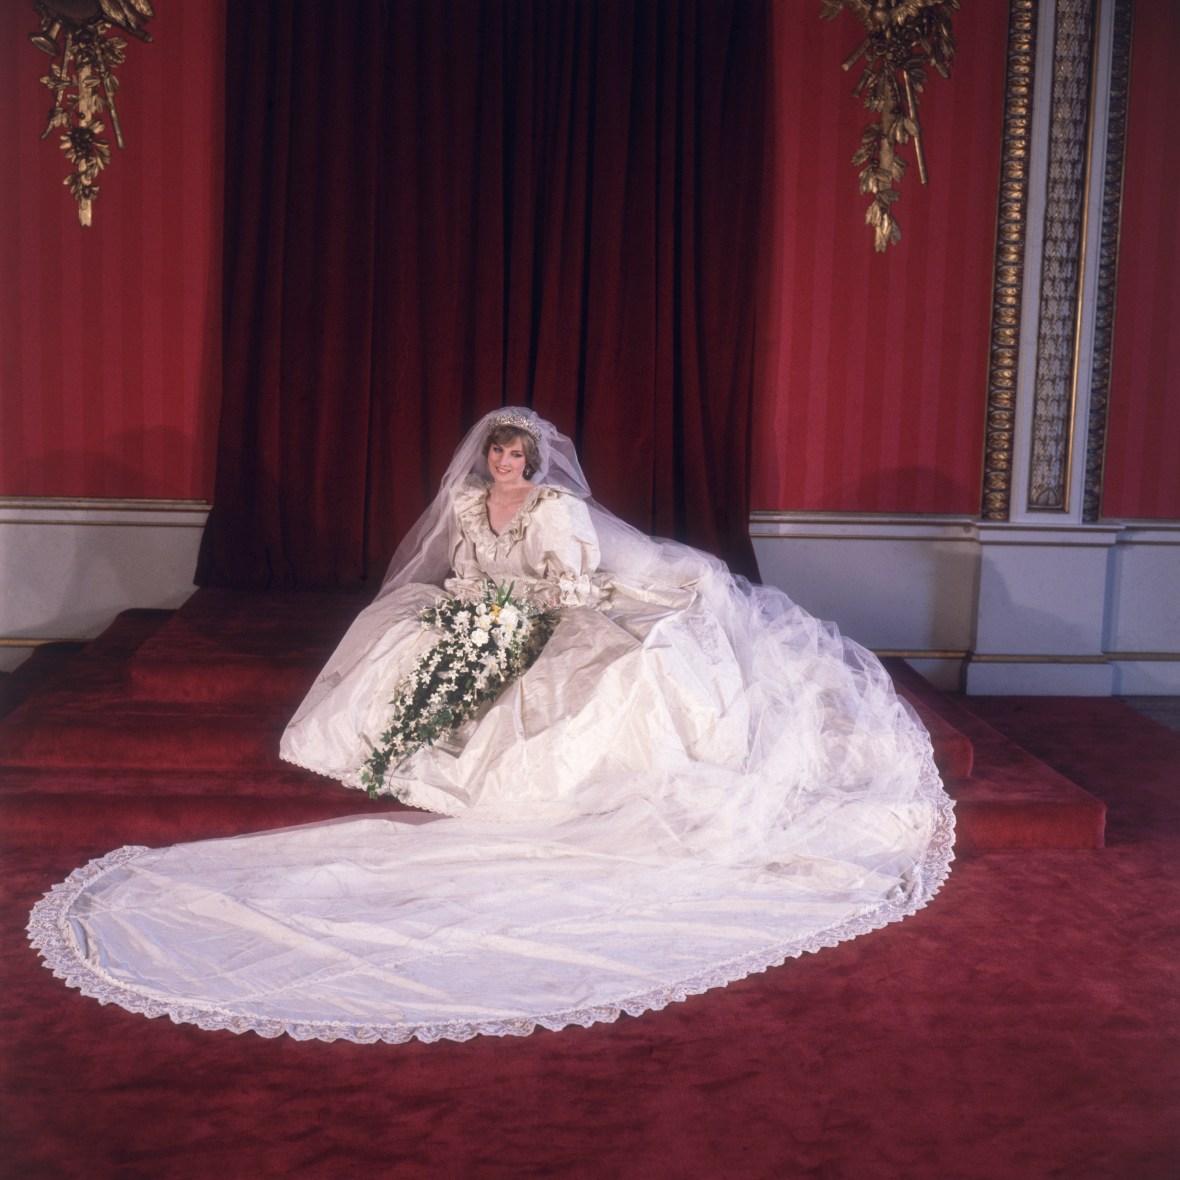 princess diana wedding bouquet getty